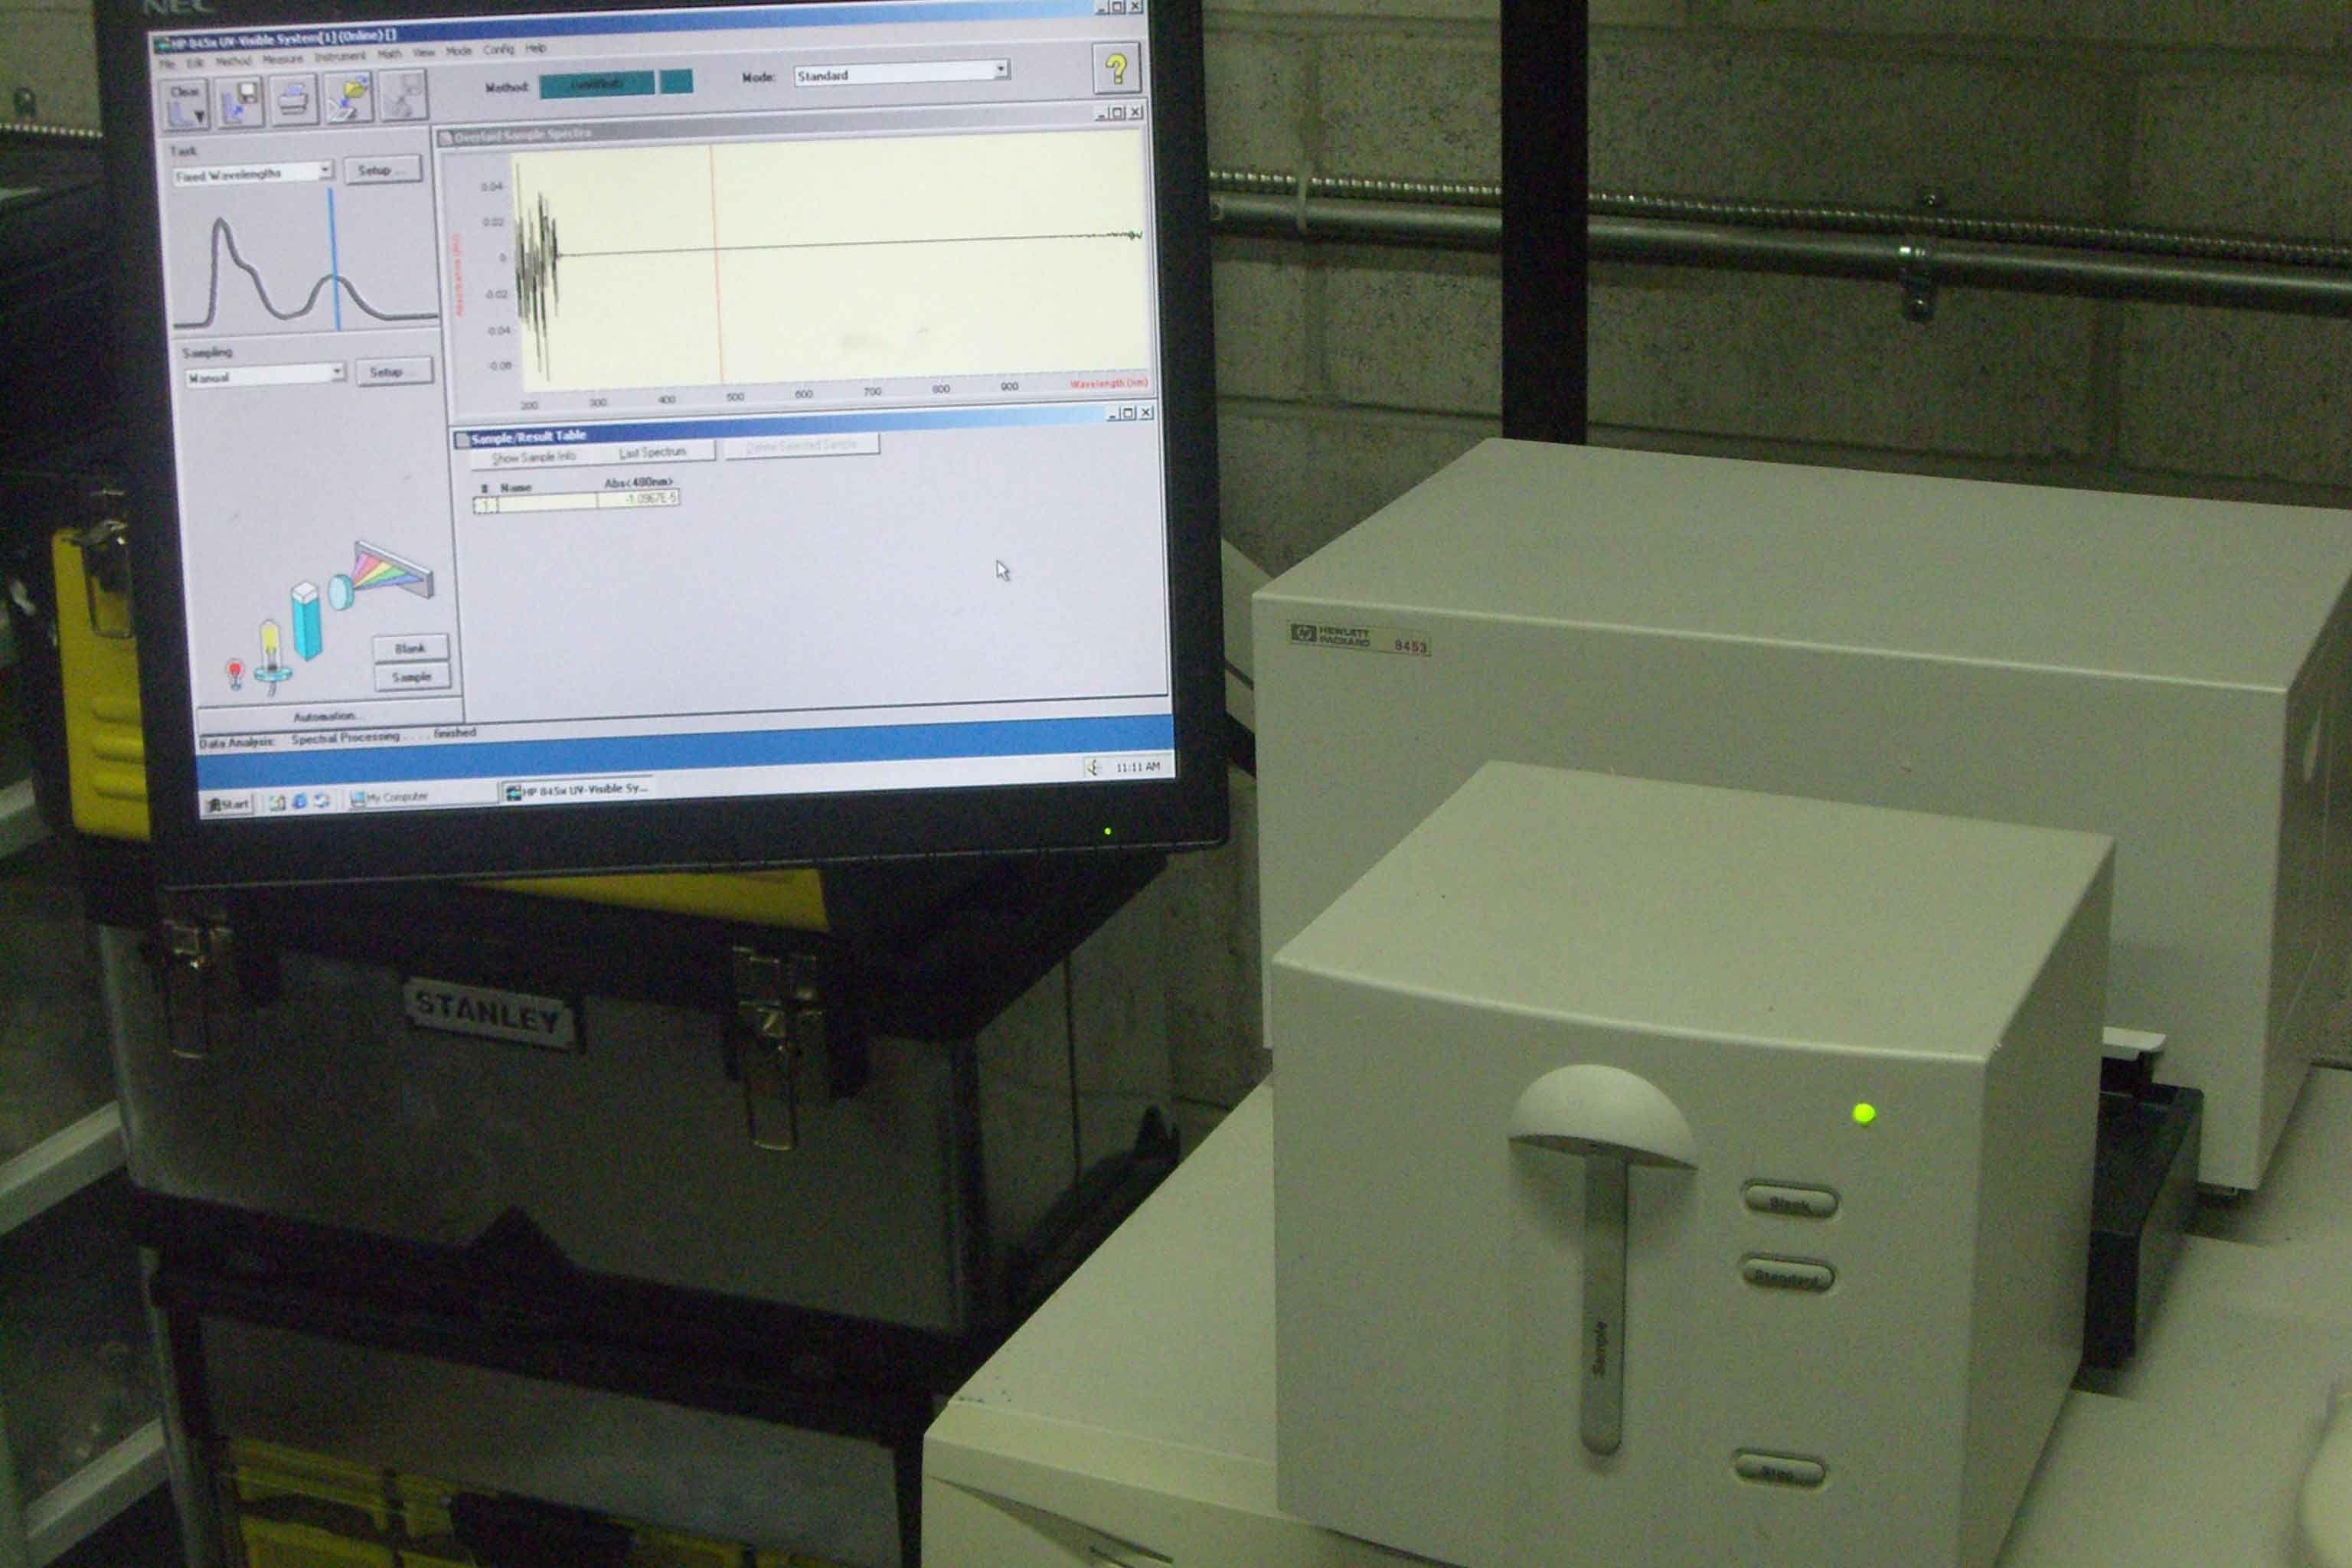 HP/Agilent 8453 DAD Spectrophotometer